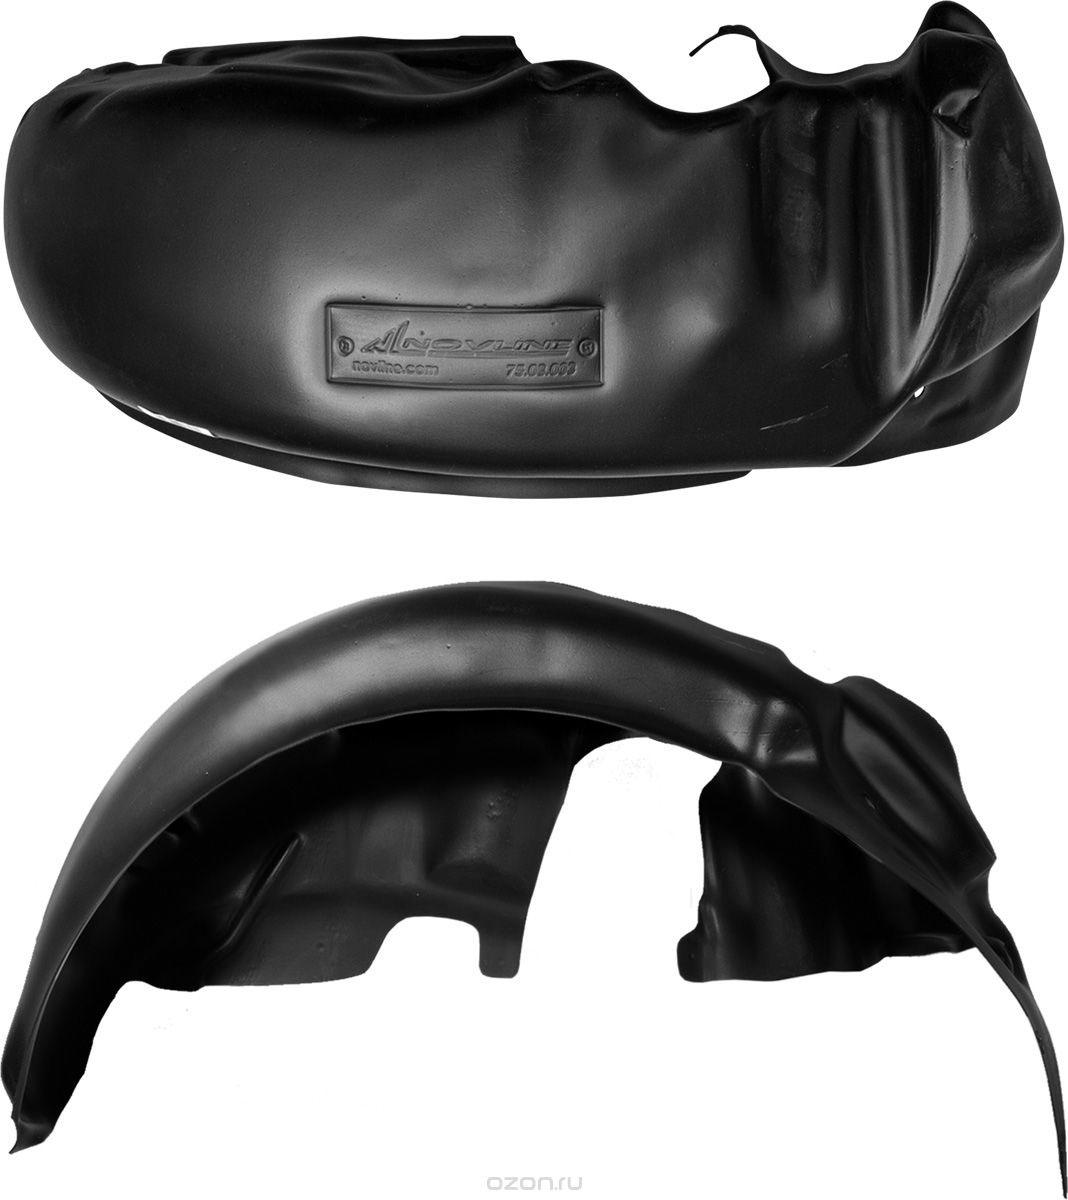 Подкрылок Novline-Autofamily, для Chevrolet Aveo, 2008->, хэтчбек, передний левый подкрылок novline autofamily chevrolet cobalt 2013 седан